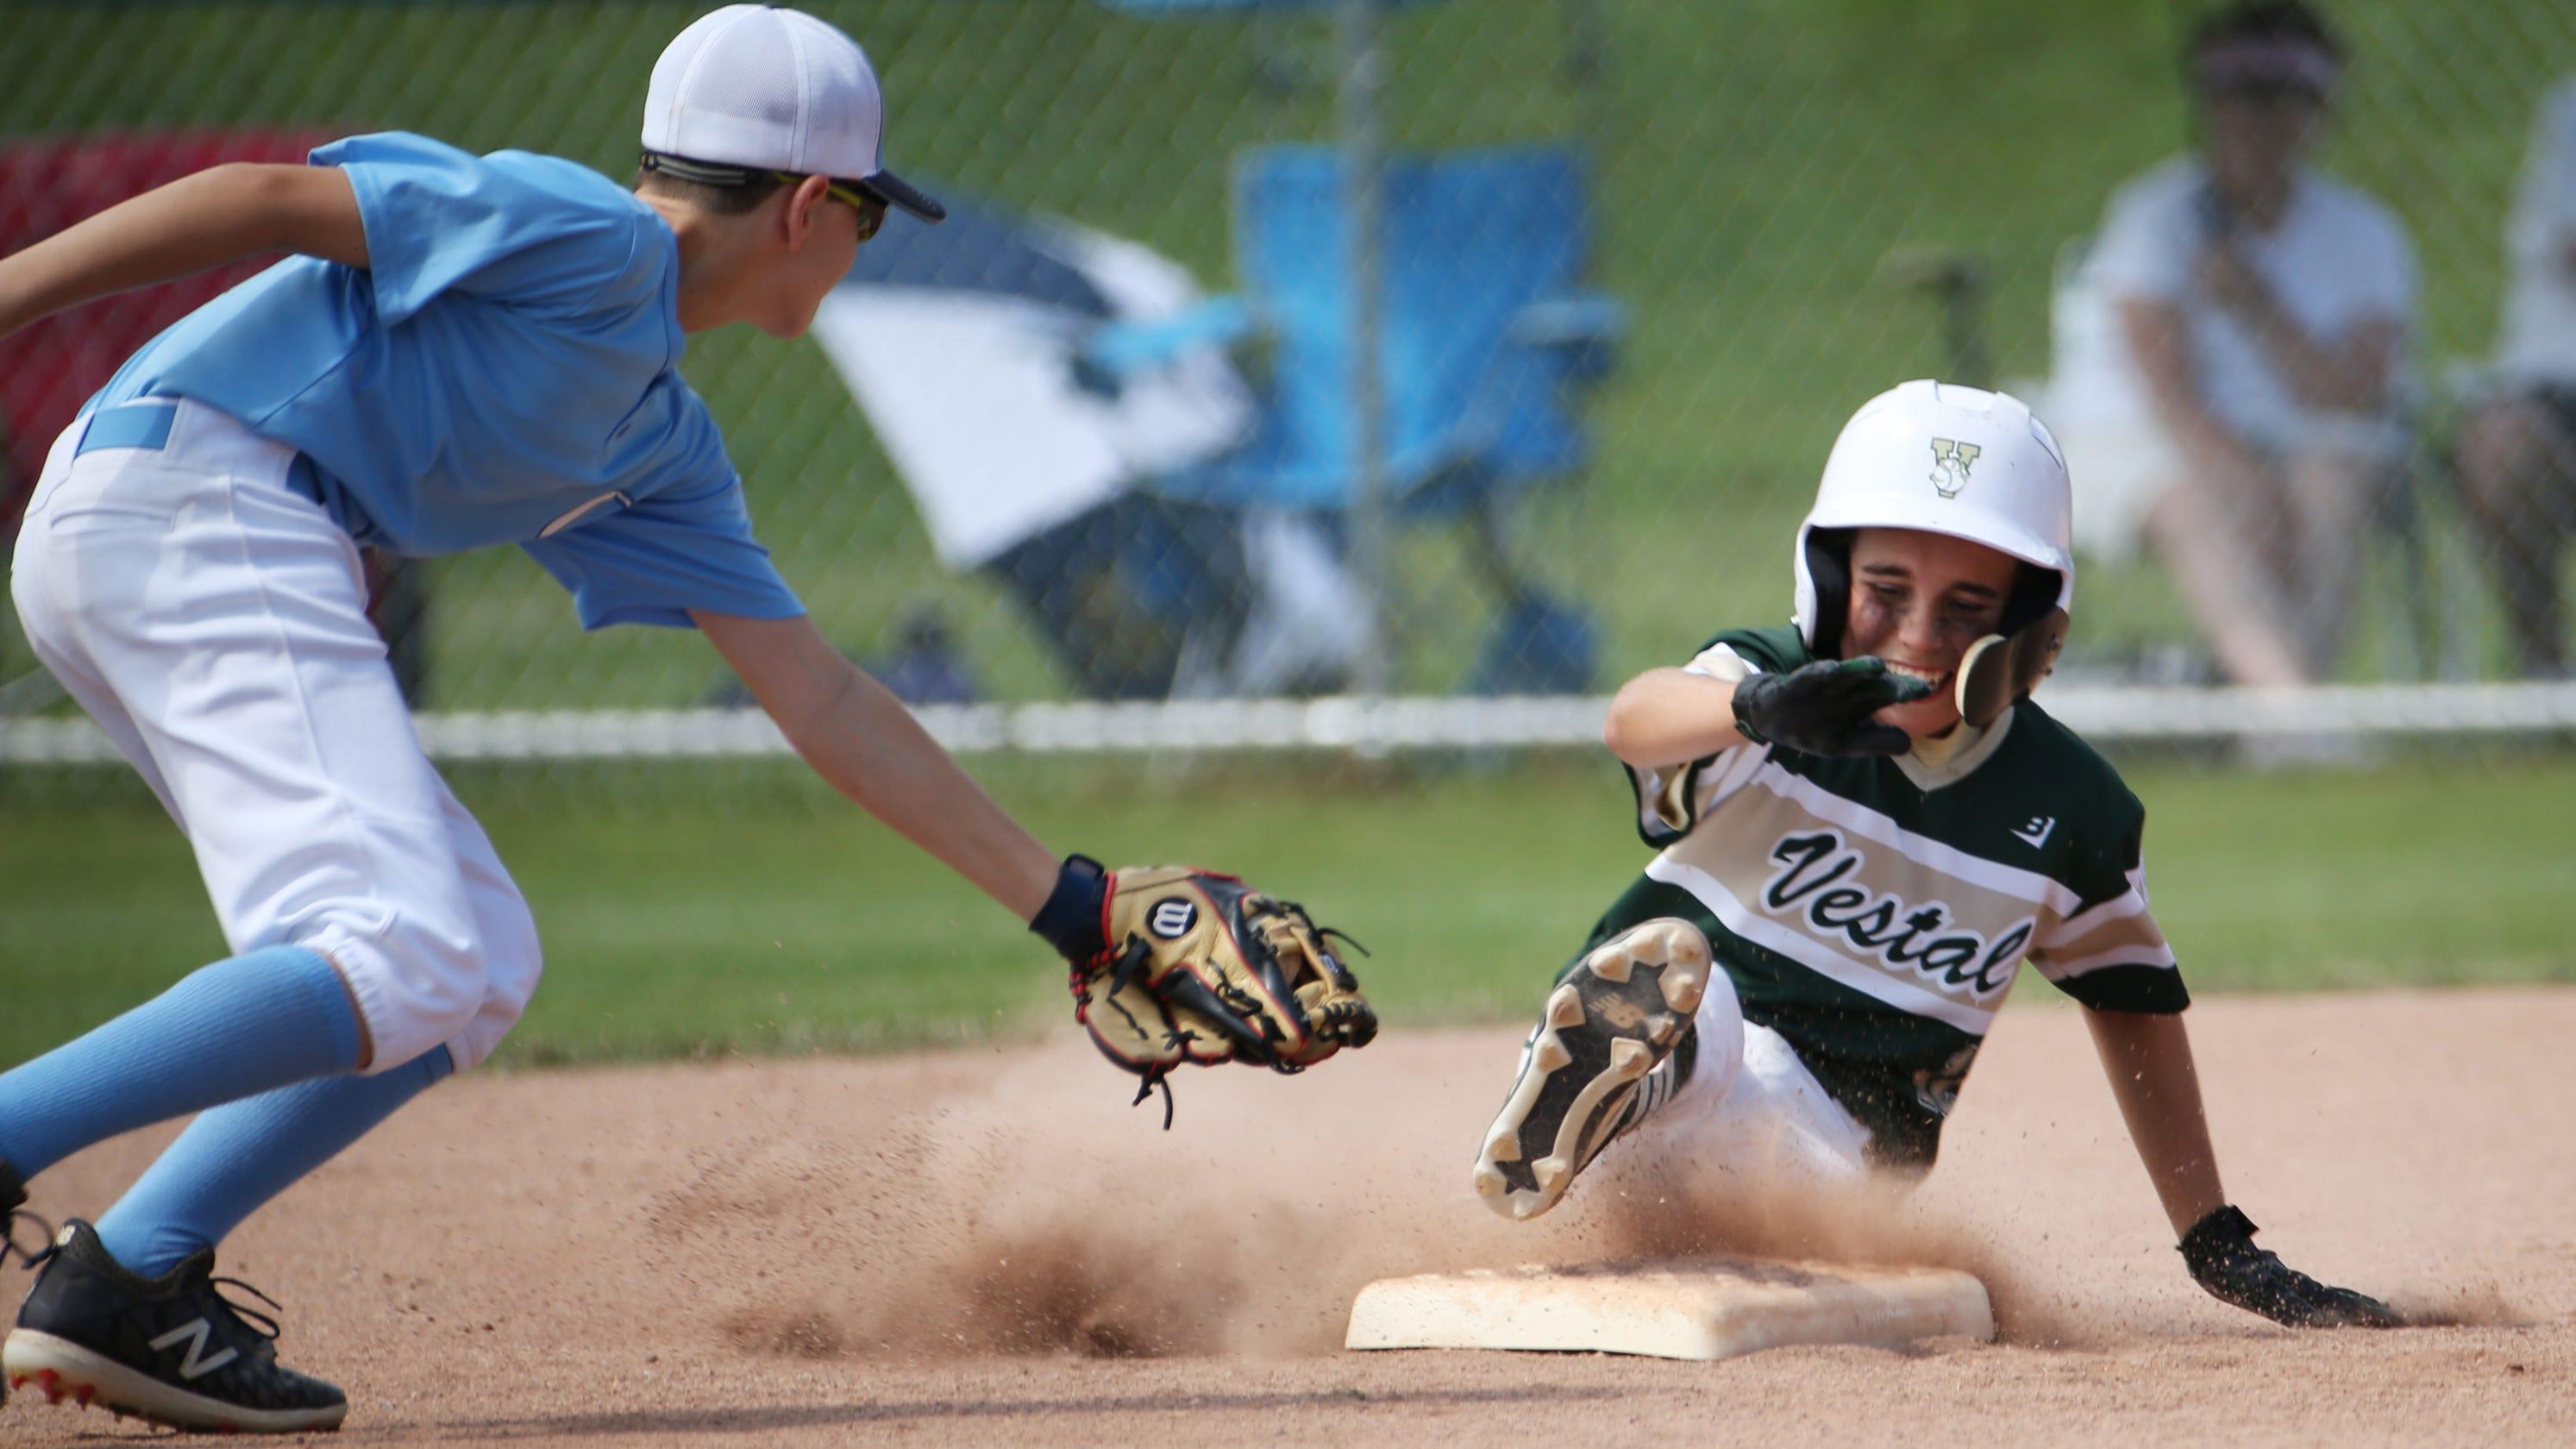 NYS Little League Tournament: Vestal loses opener to Oceanside